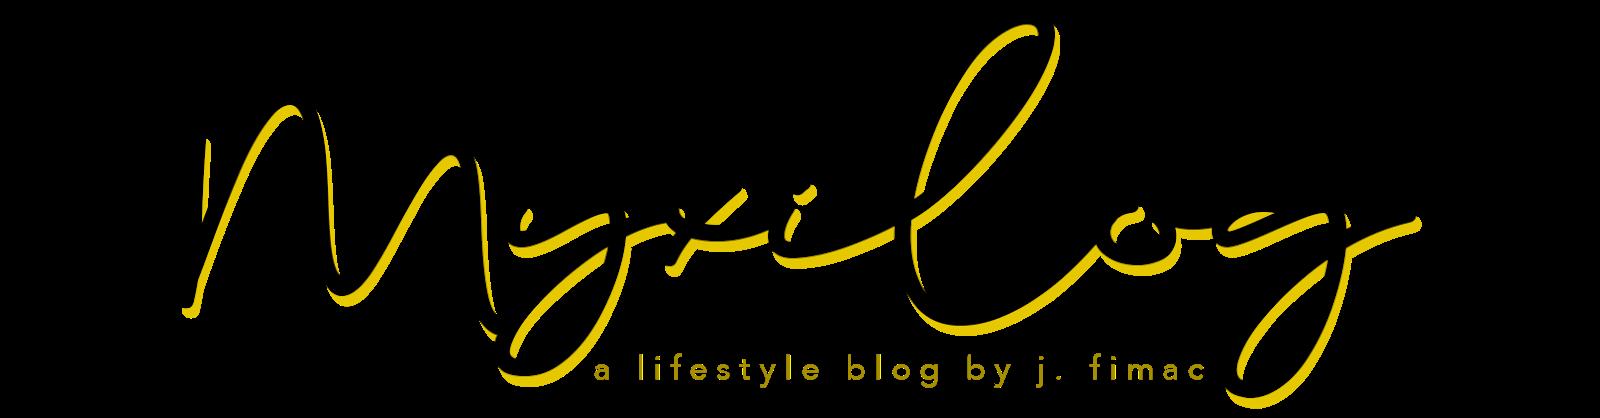 www.myxilog.com